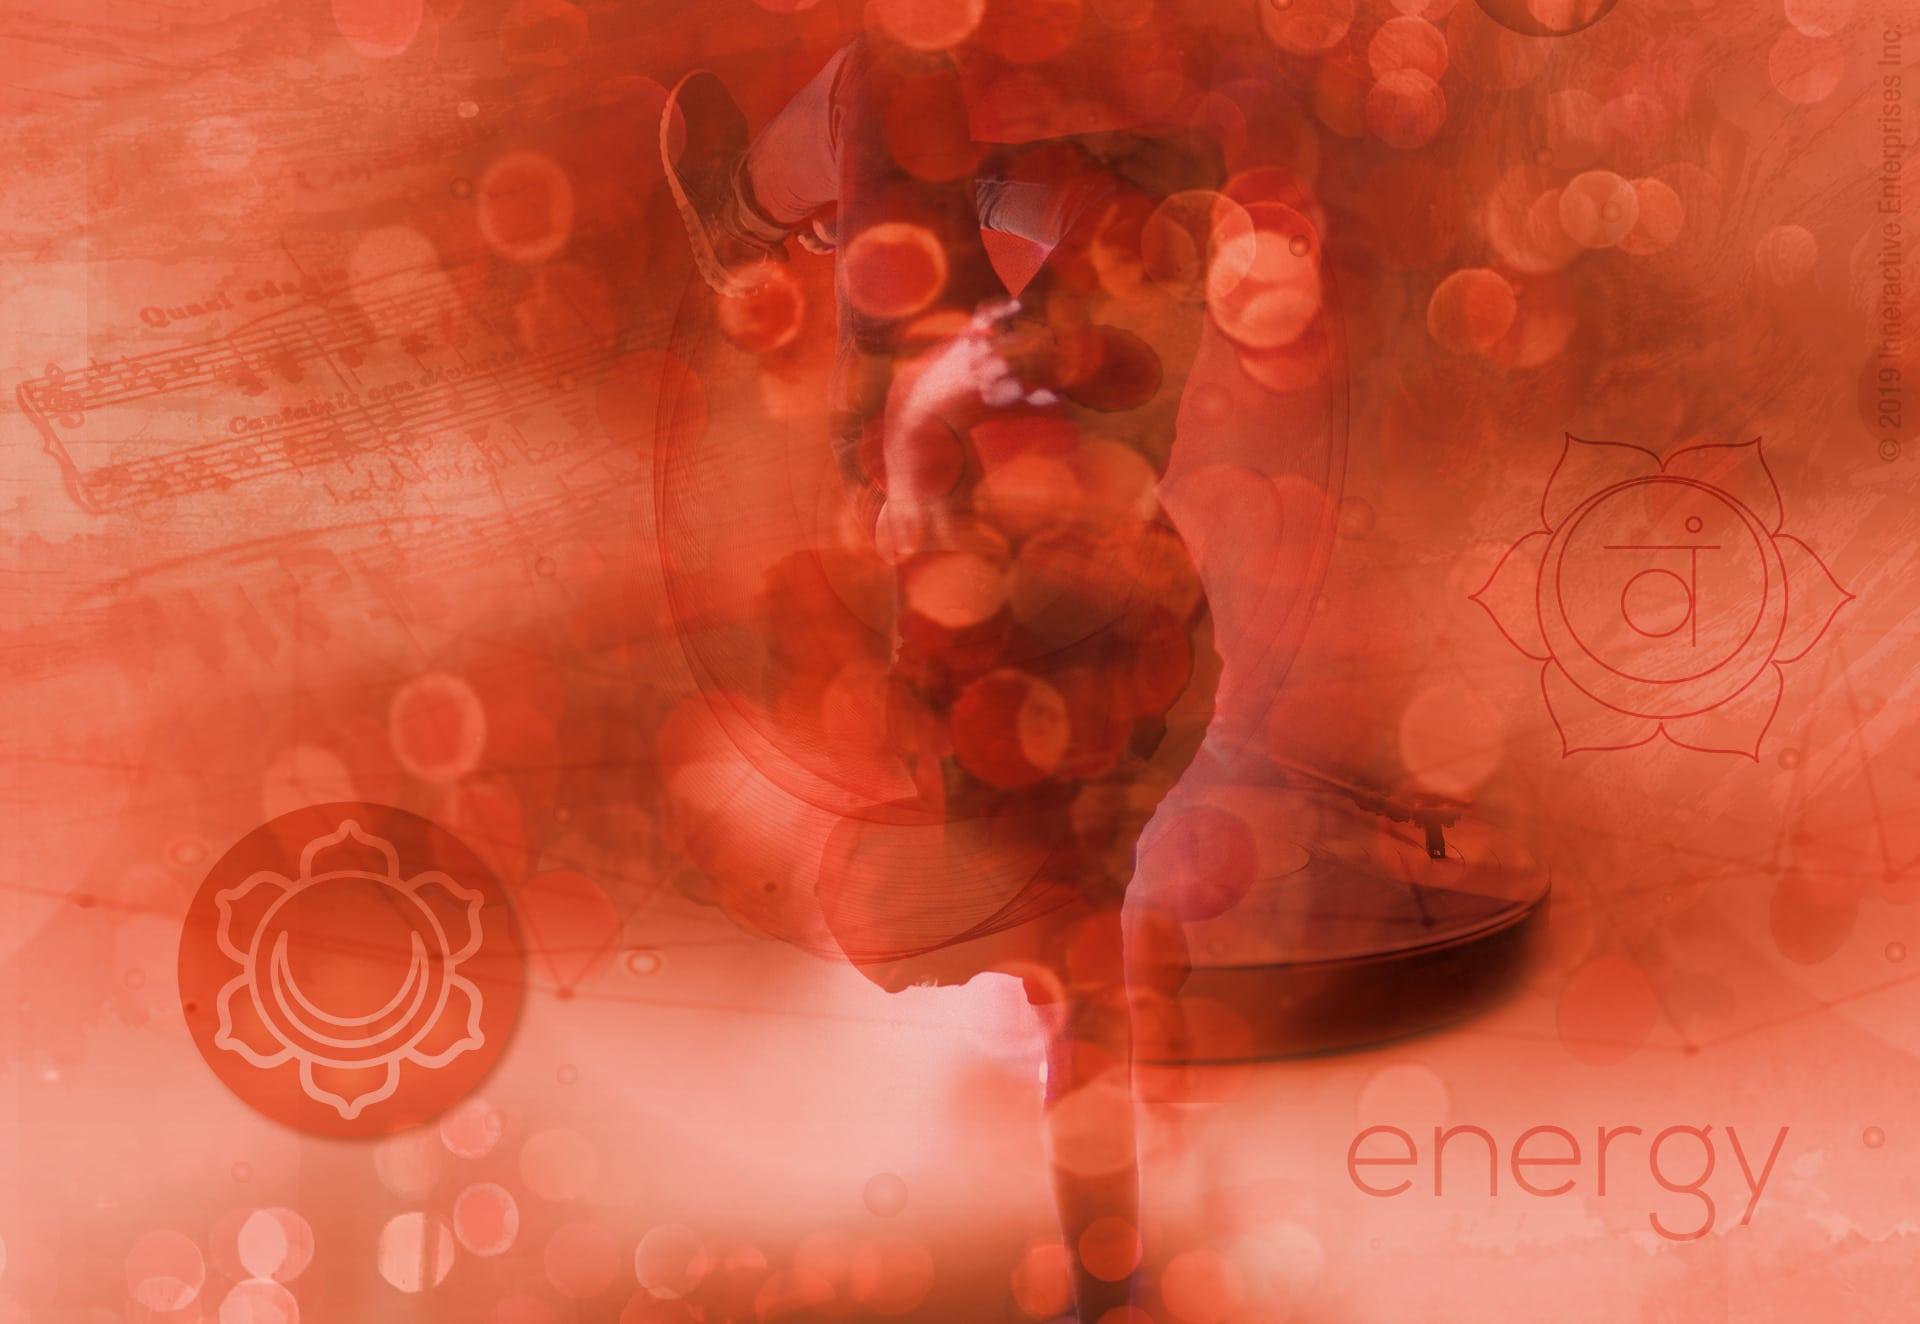 Orange aura meaning